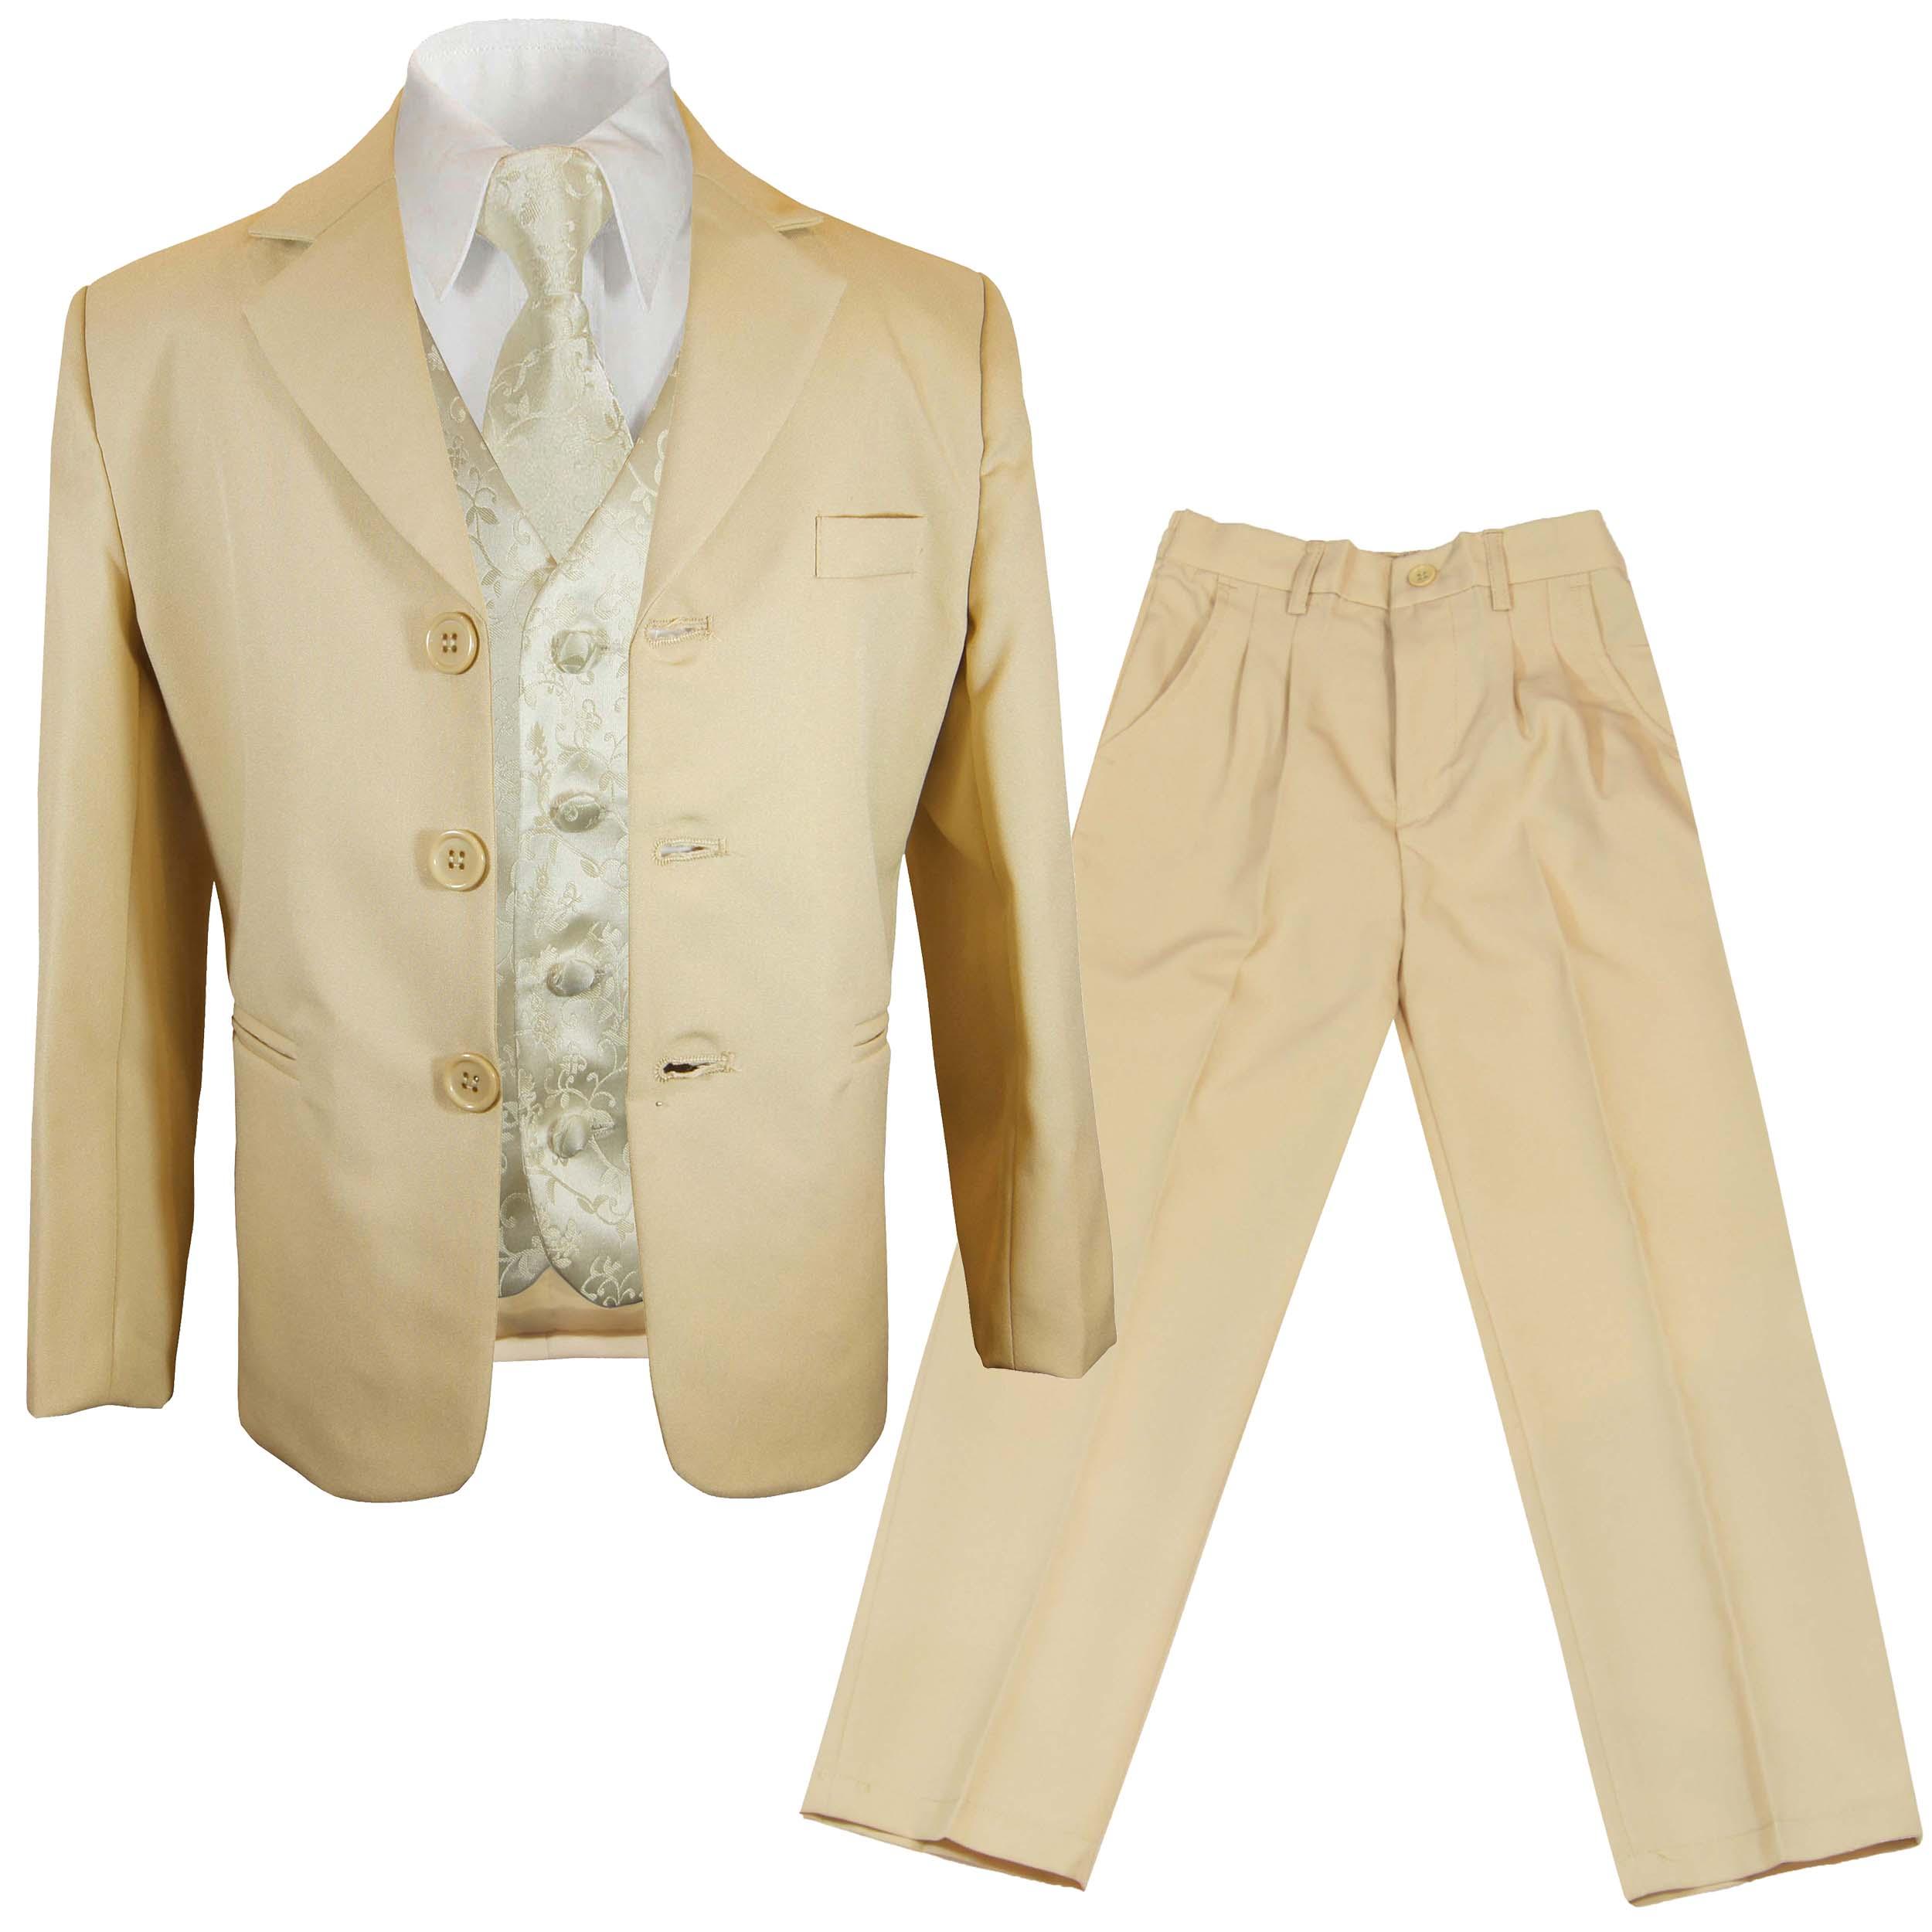 Kommunionanzug beige + champagner Weste Paul Malone Shop